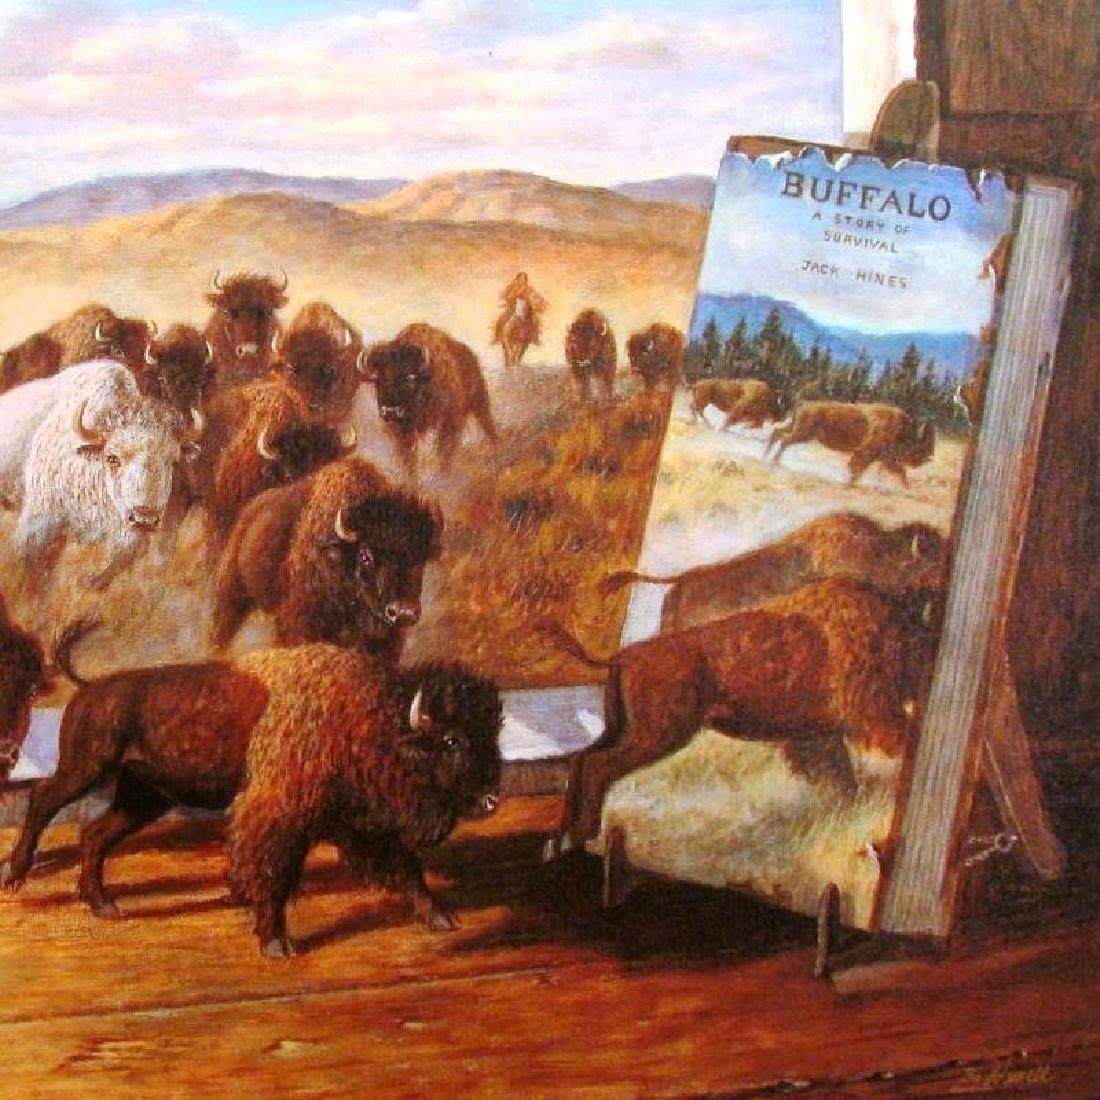 Buffalo Signed Ltd Ed Fantastic Realistic Wild West - 2